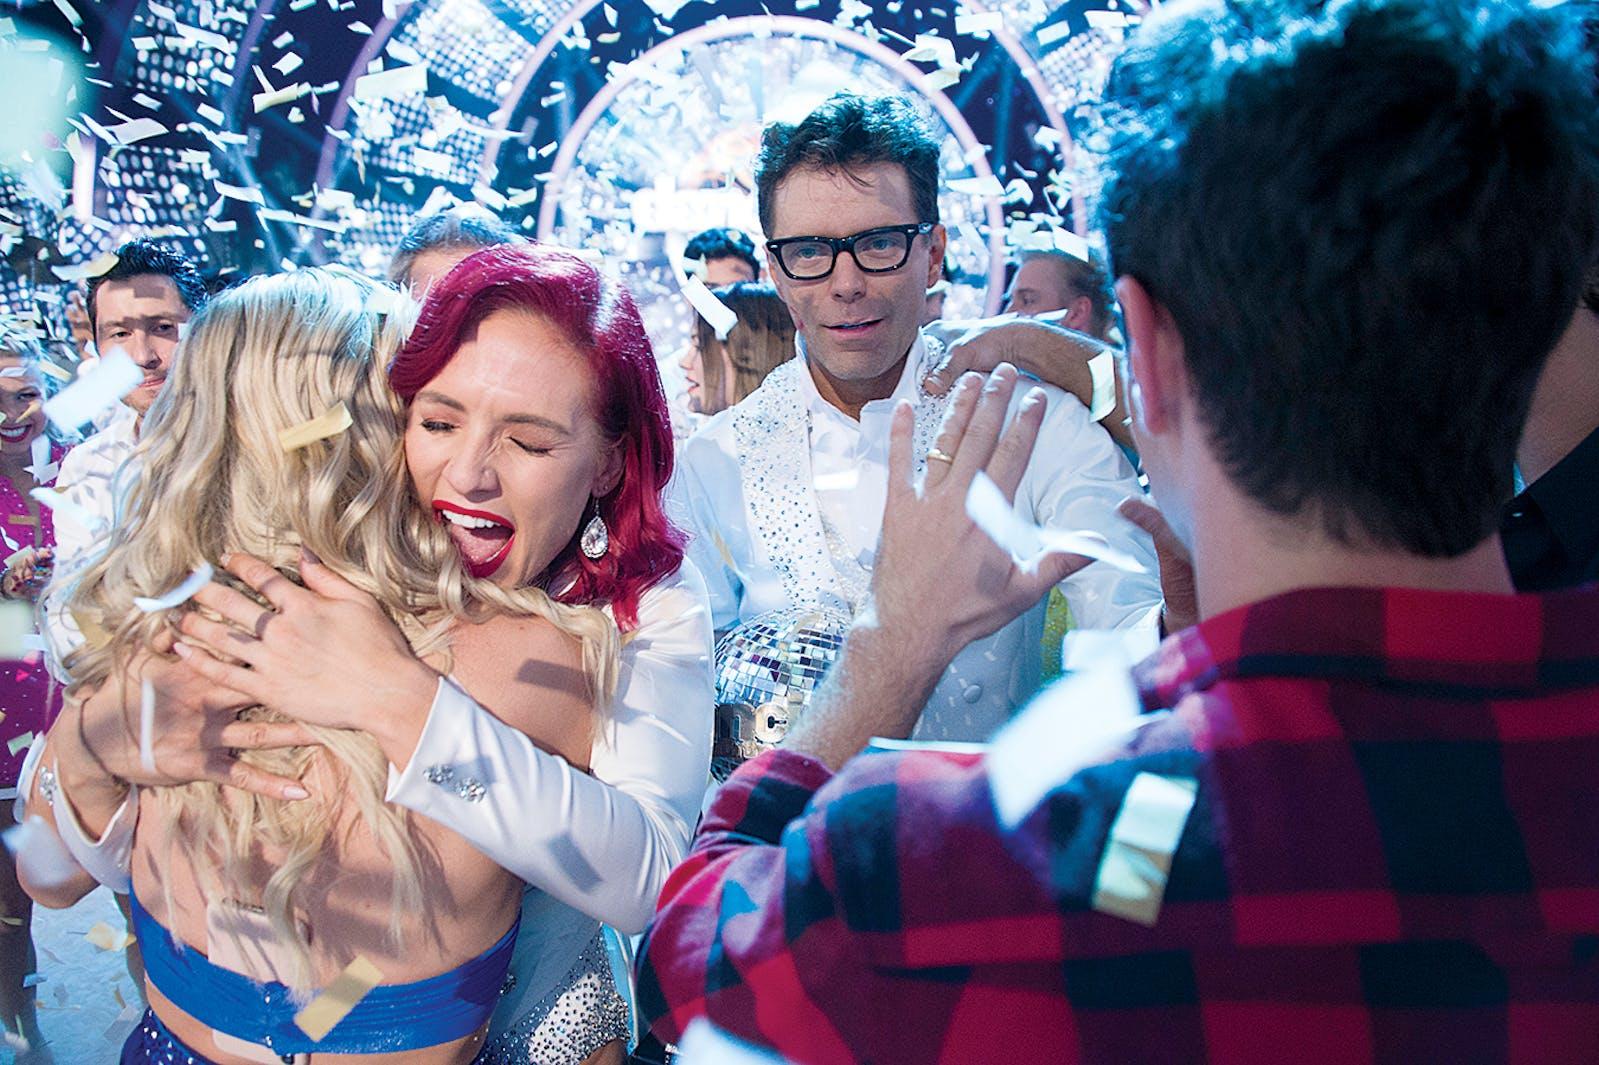 The radio DJ winning Dancing With the Stars on November 19, 2018.